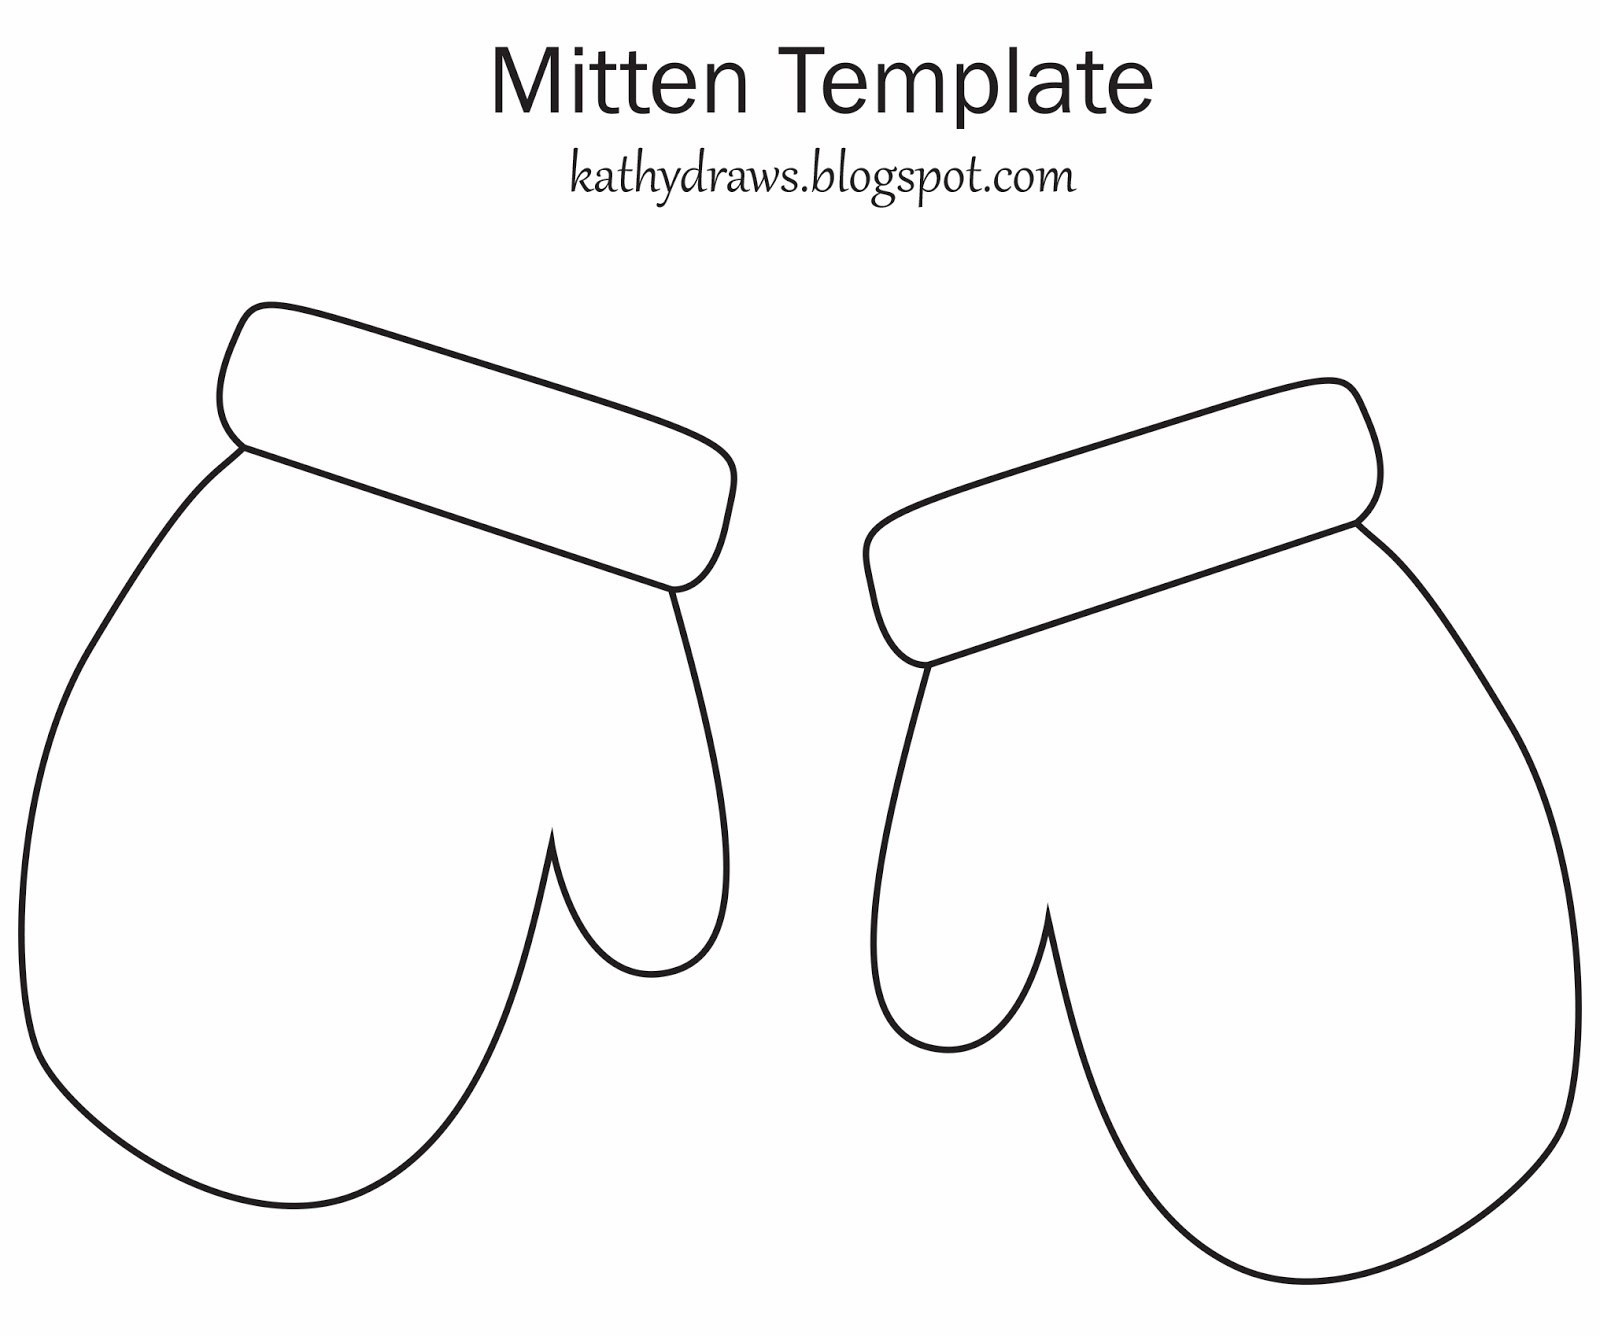 Free Mitten Template Printable